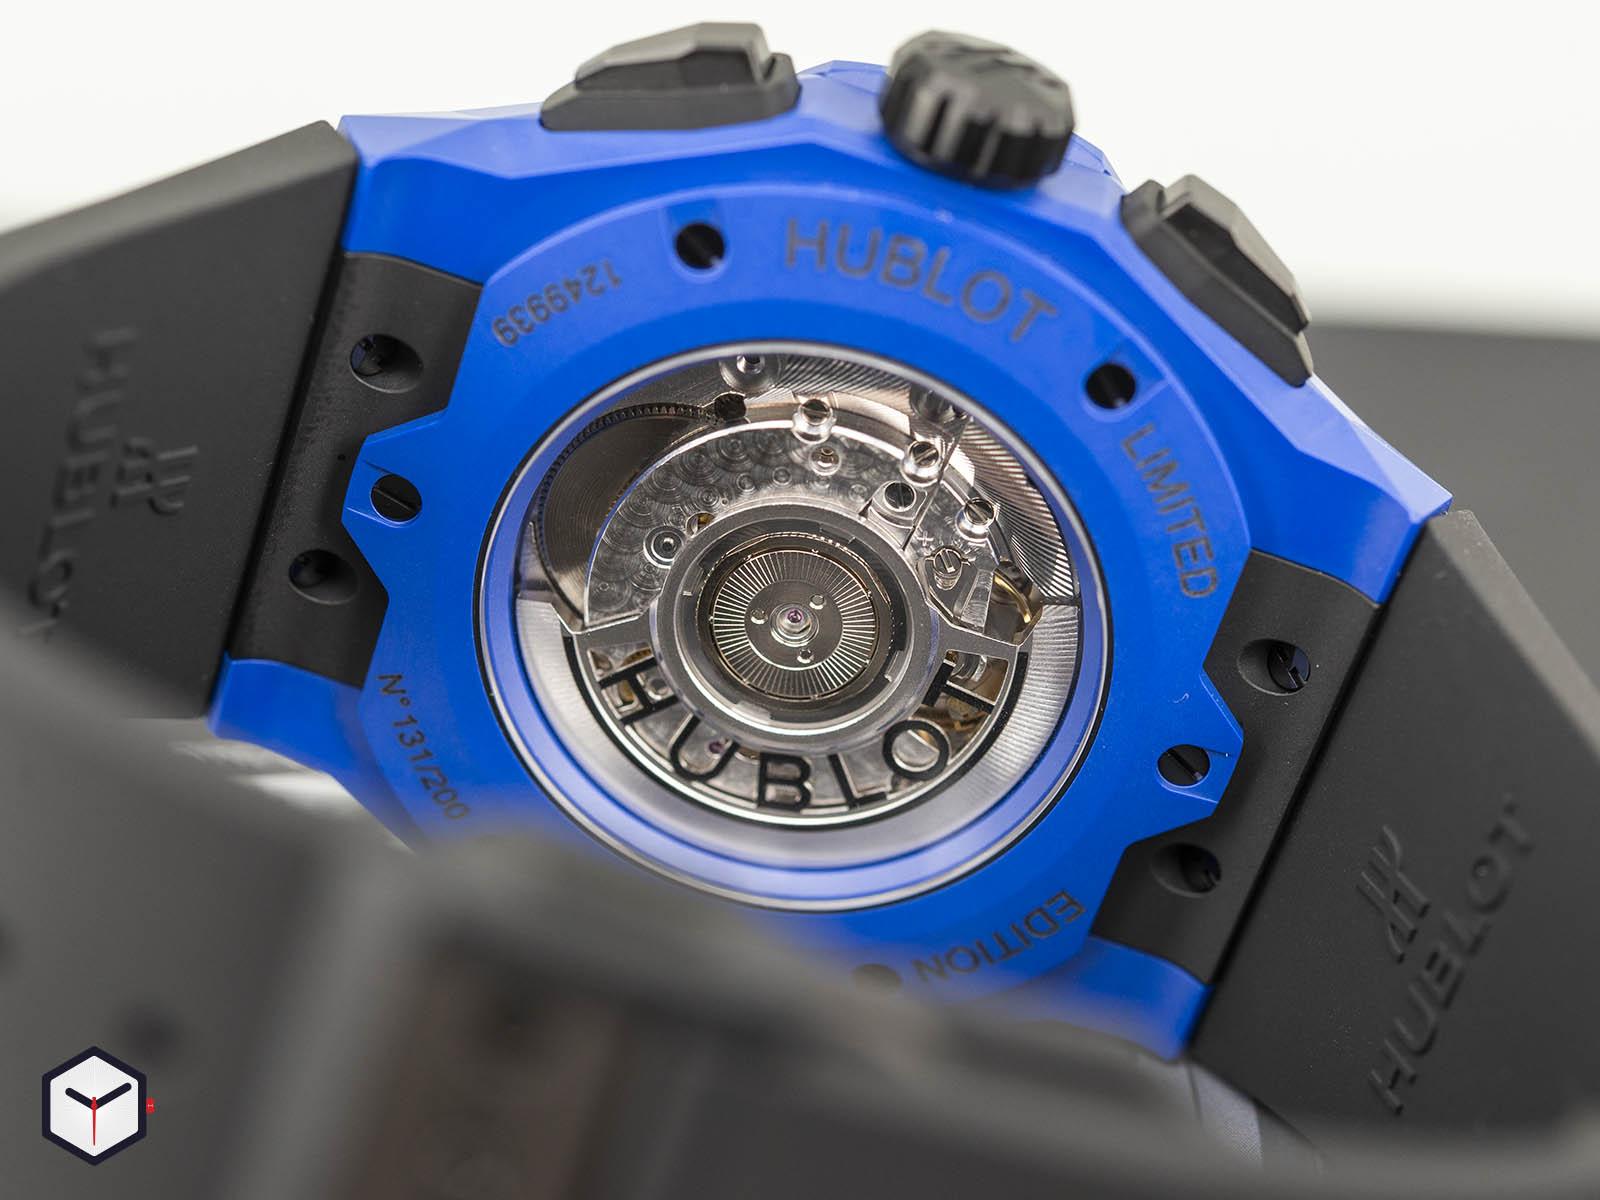 525-ex-0179-rx-orl18-hublot-aerofusion-chronograph-orlinski-blue-ceramic-6.jpg